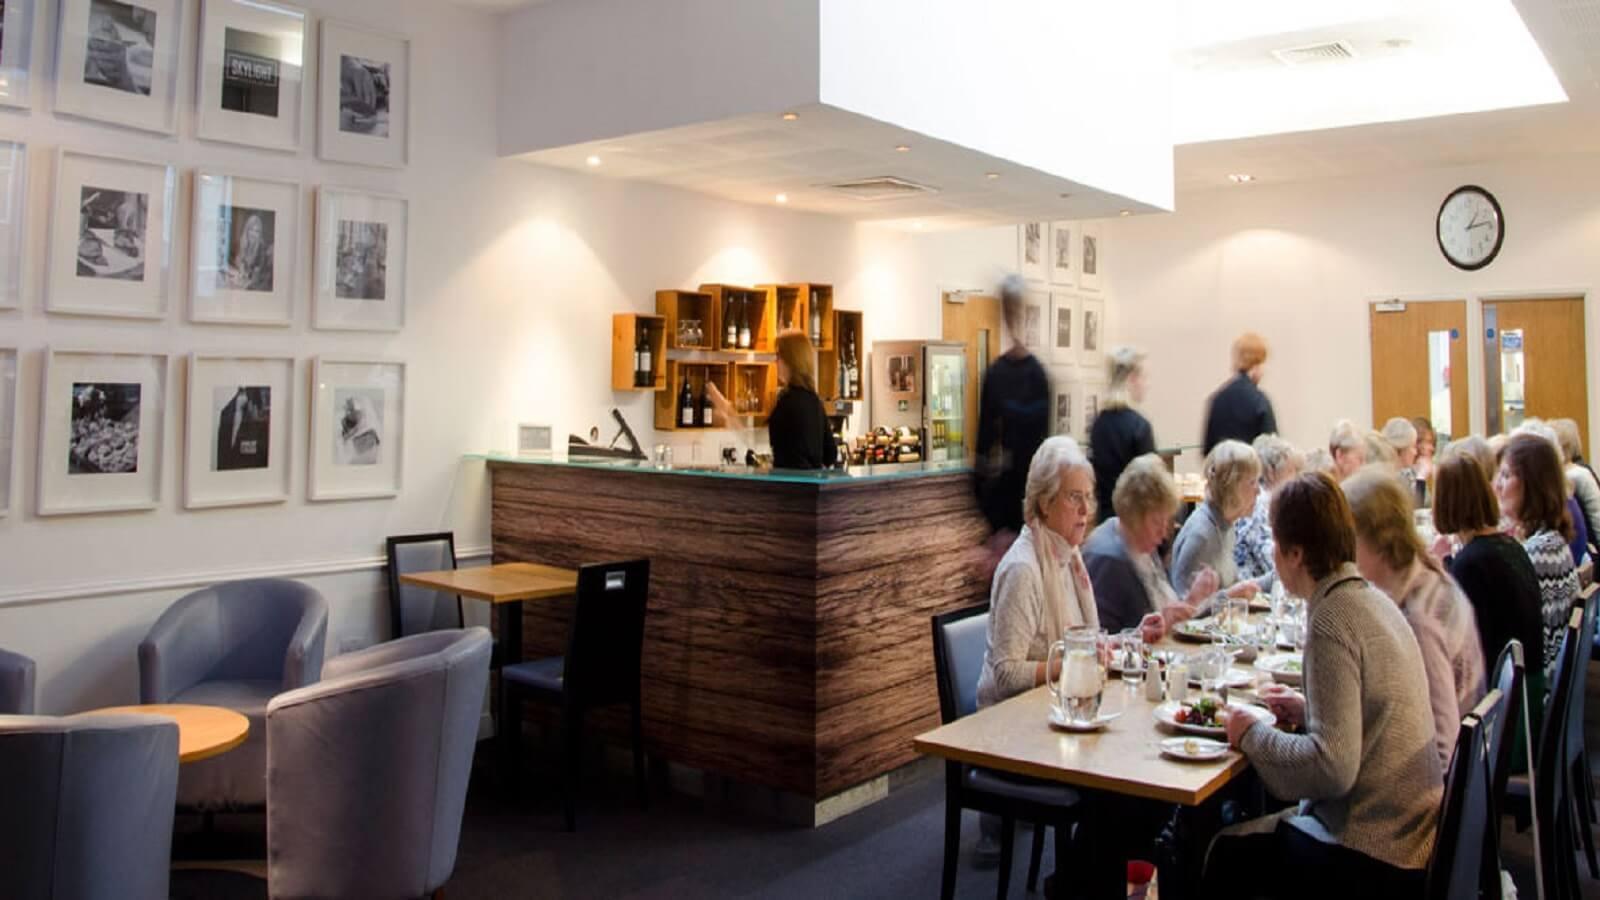 Skylight Restaurant at Harlow College